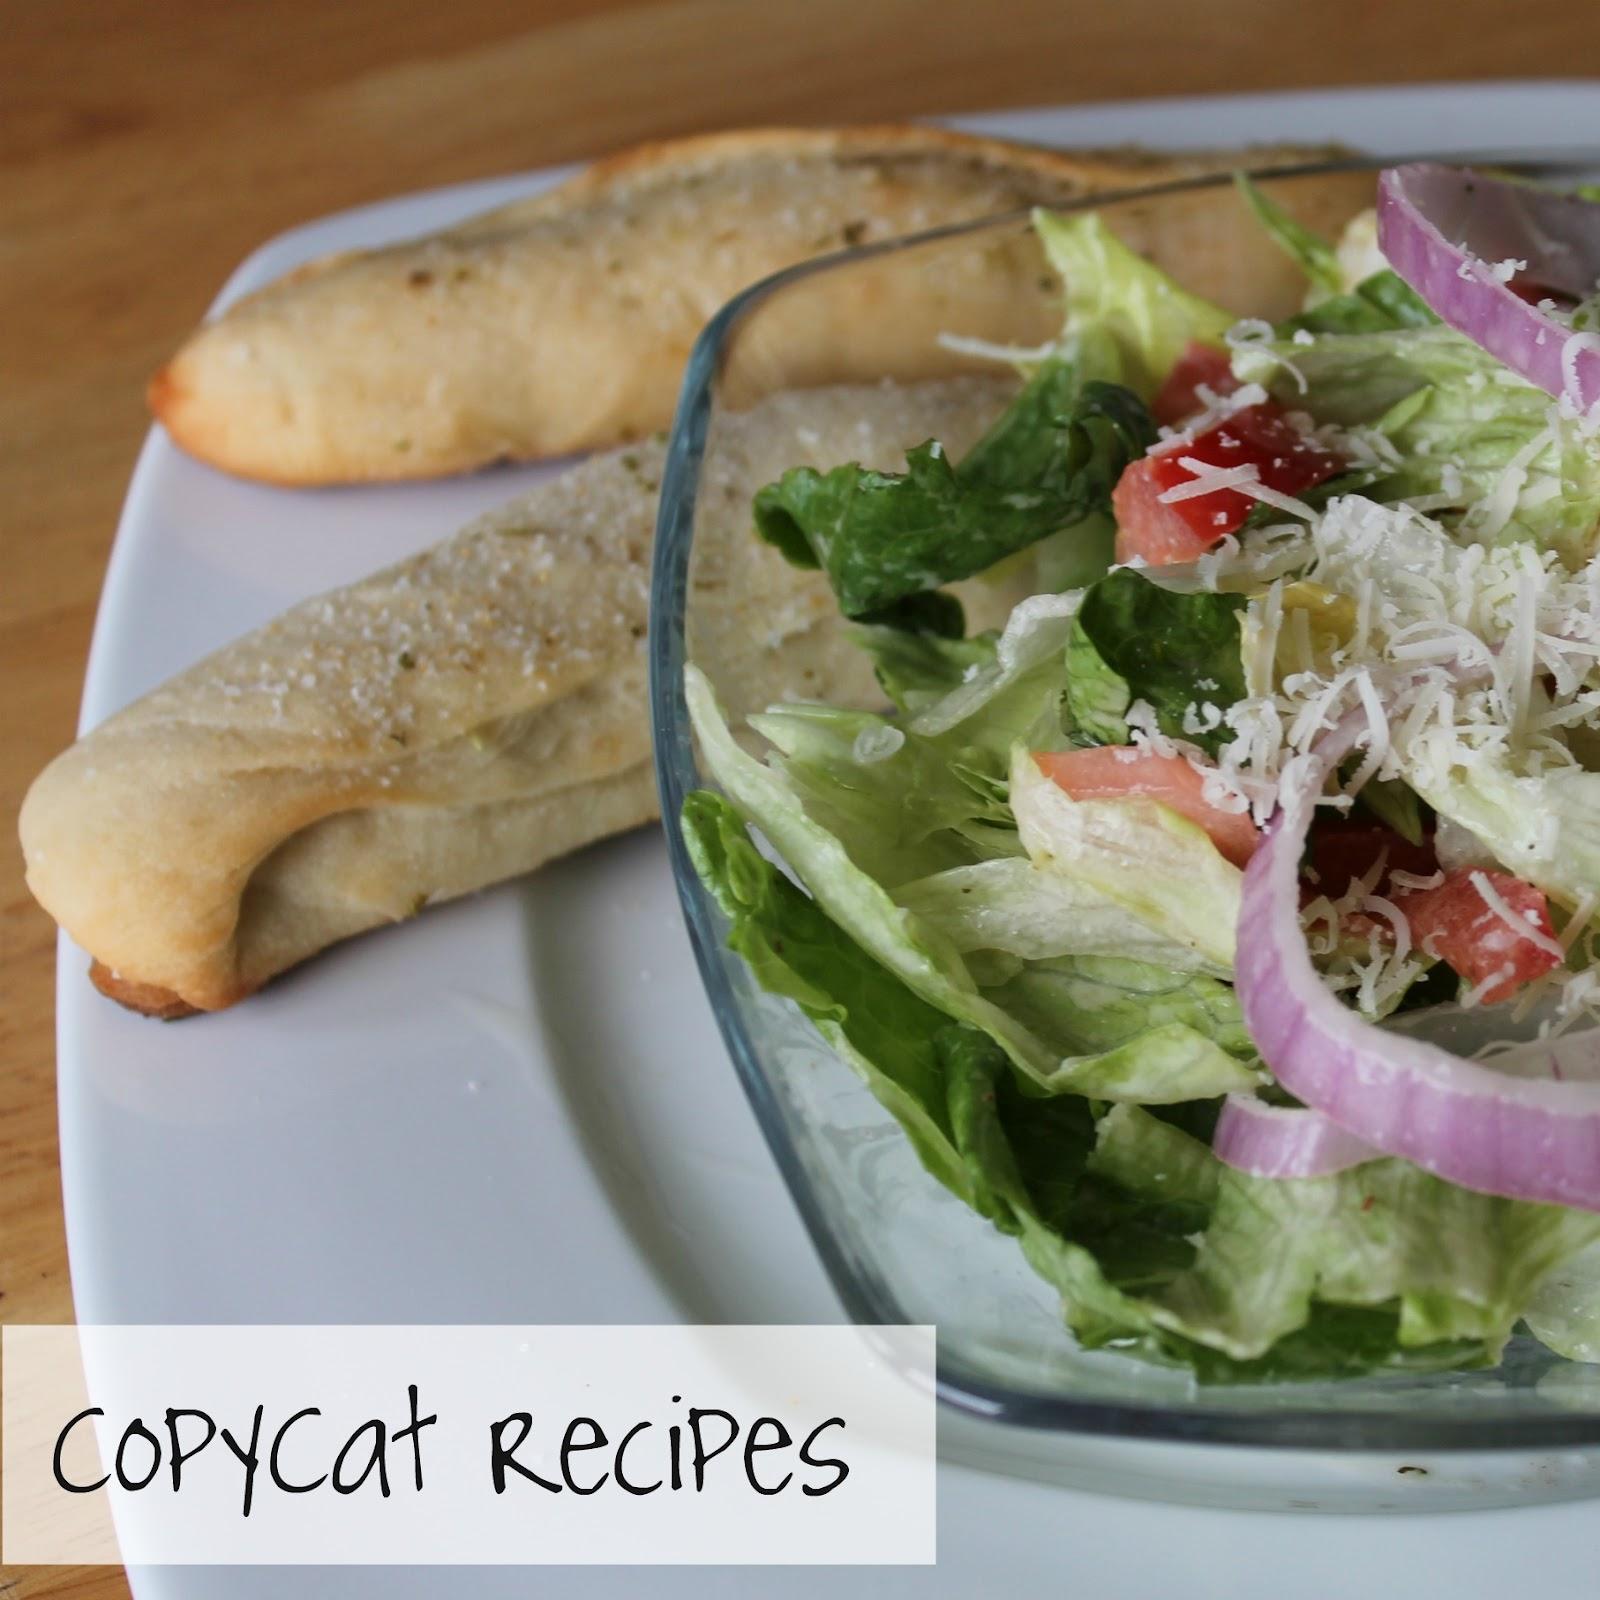 Copycat recipes olive garden salad breadsticks at the - Olive garden breadsticks copycat recipe ...